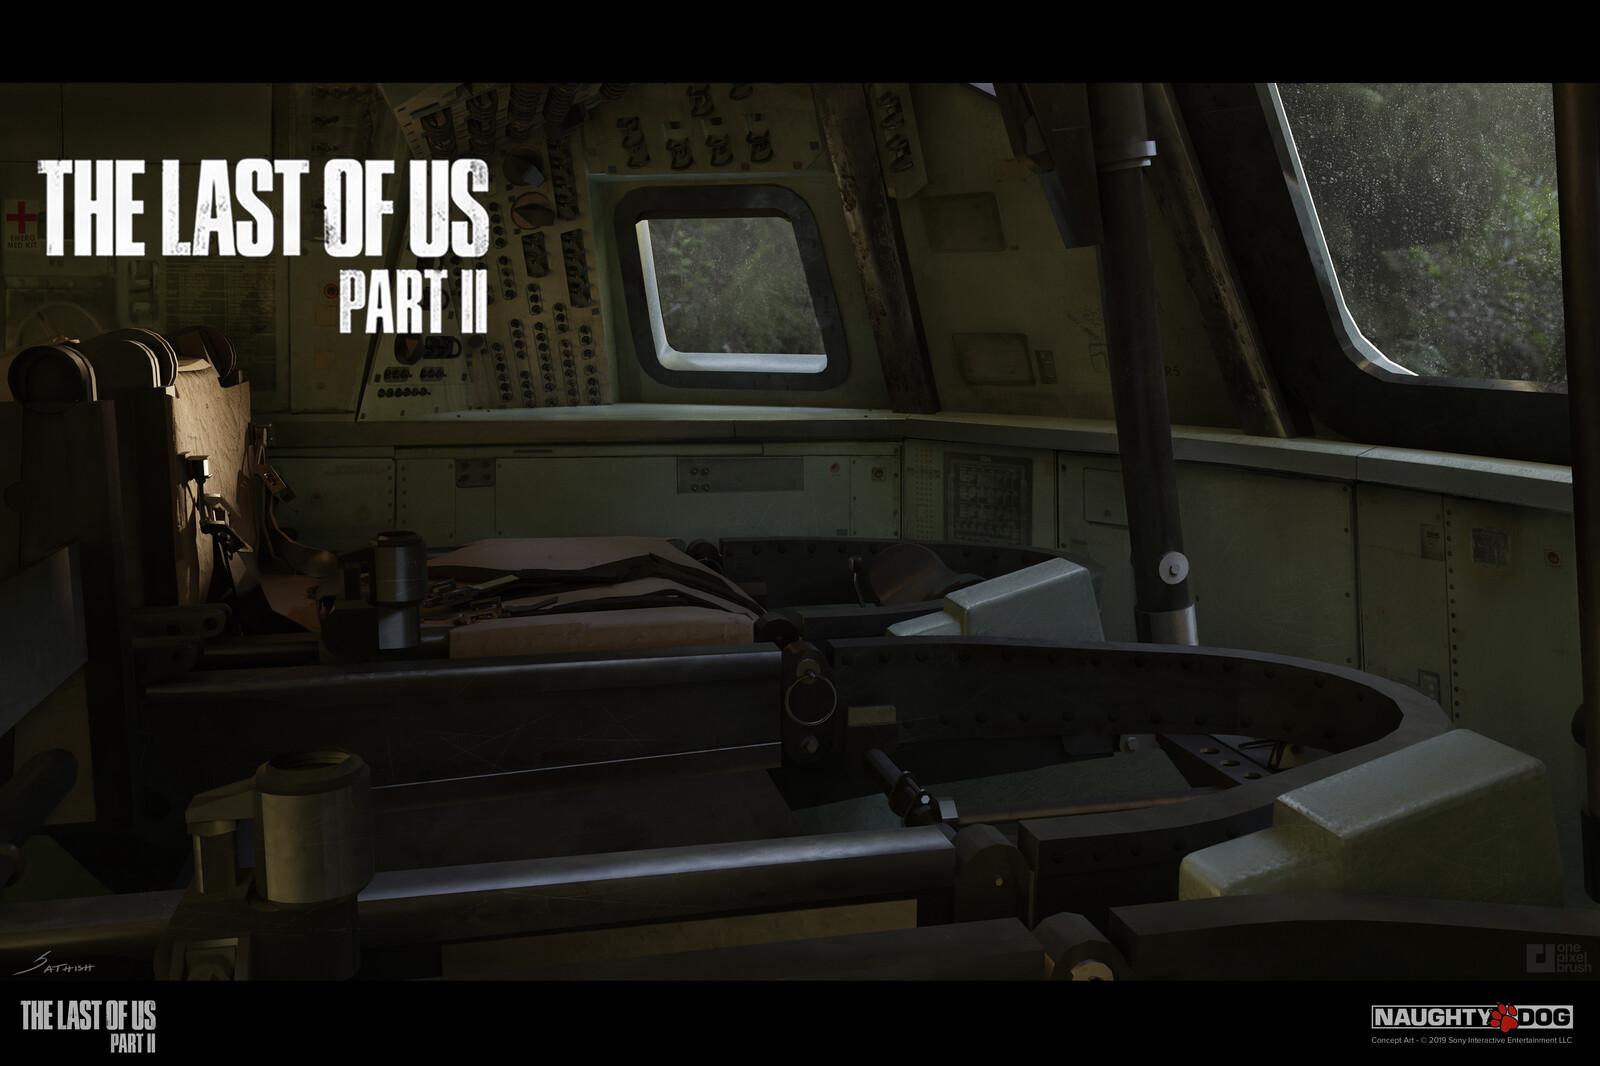 The Last of Us: Part 2 -Space Capsule